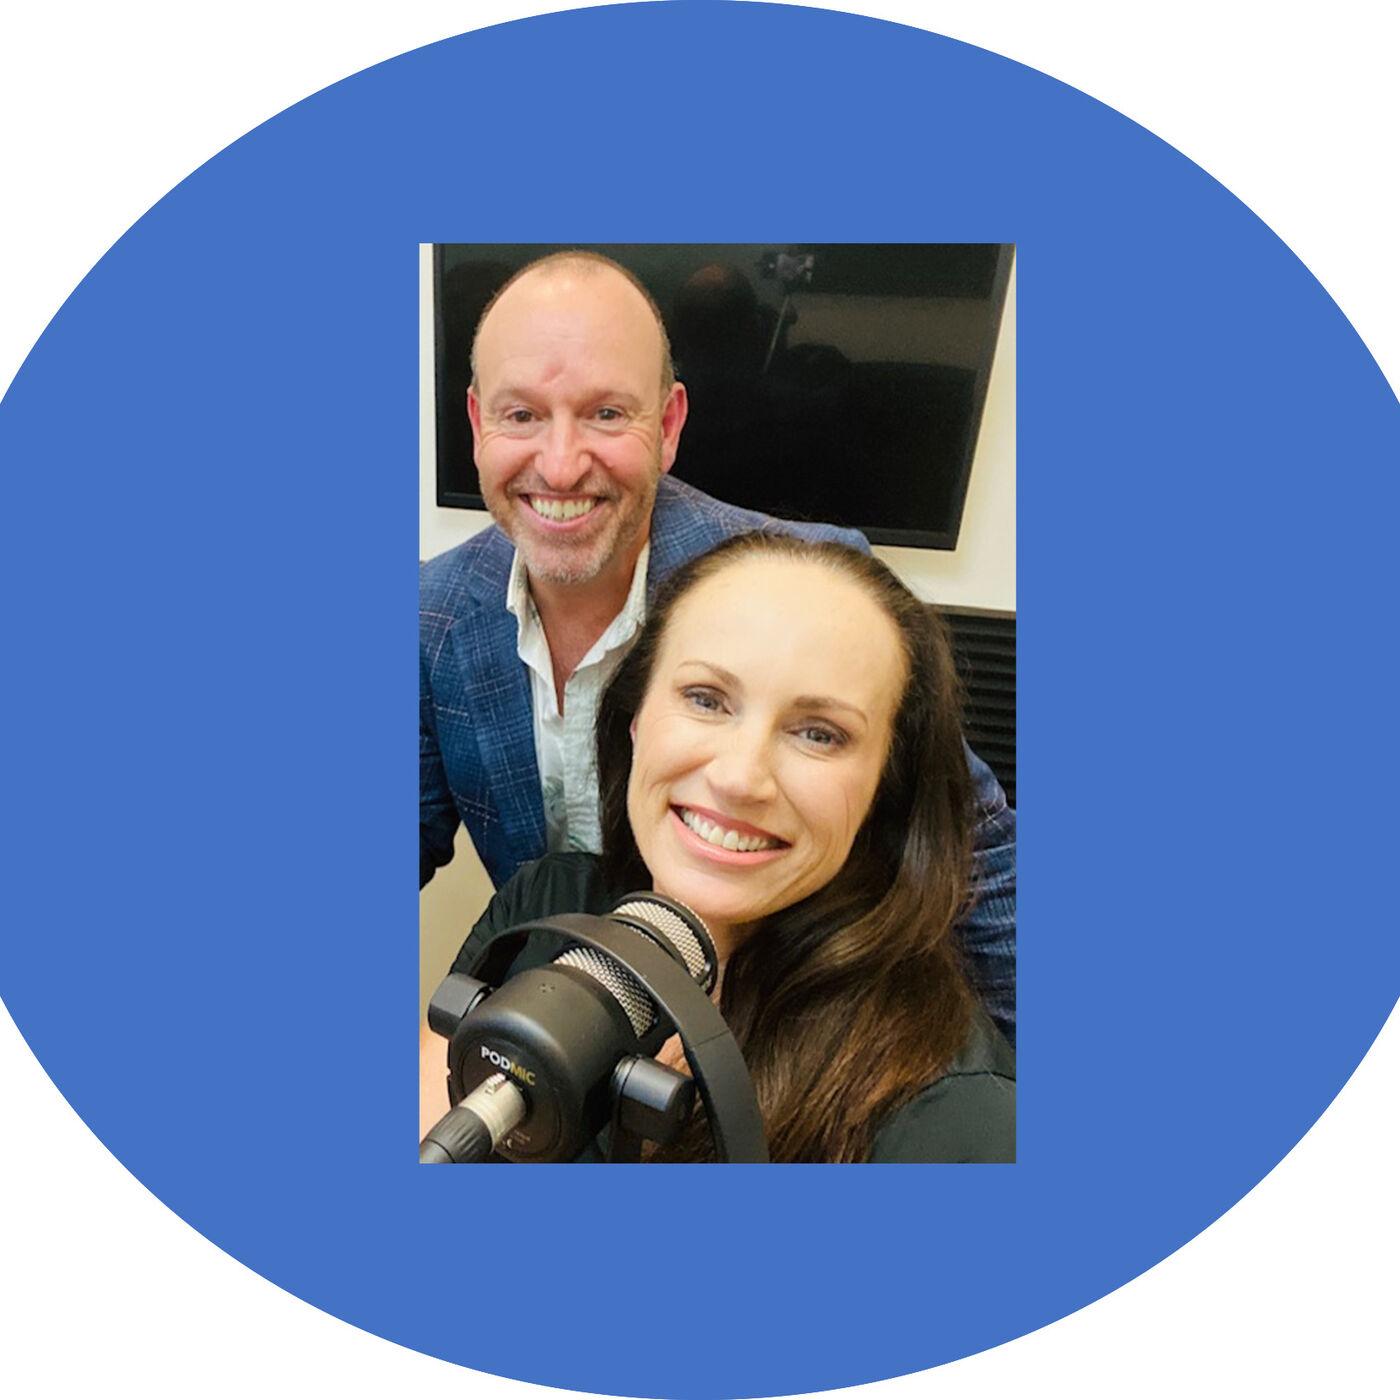 Episode 59 - Lauren & Craig - Happy Birthday & here come the ITA's!